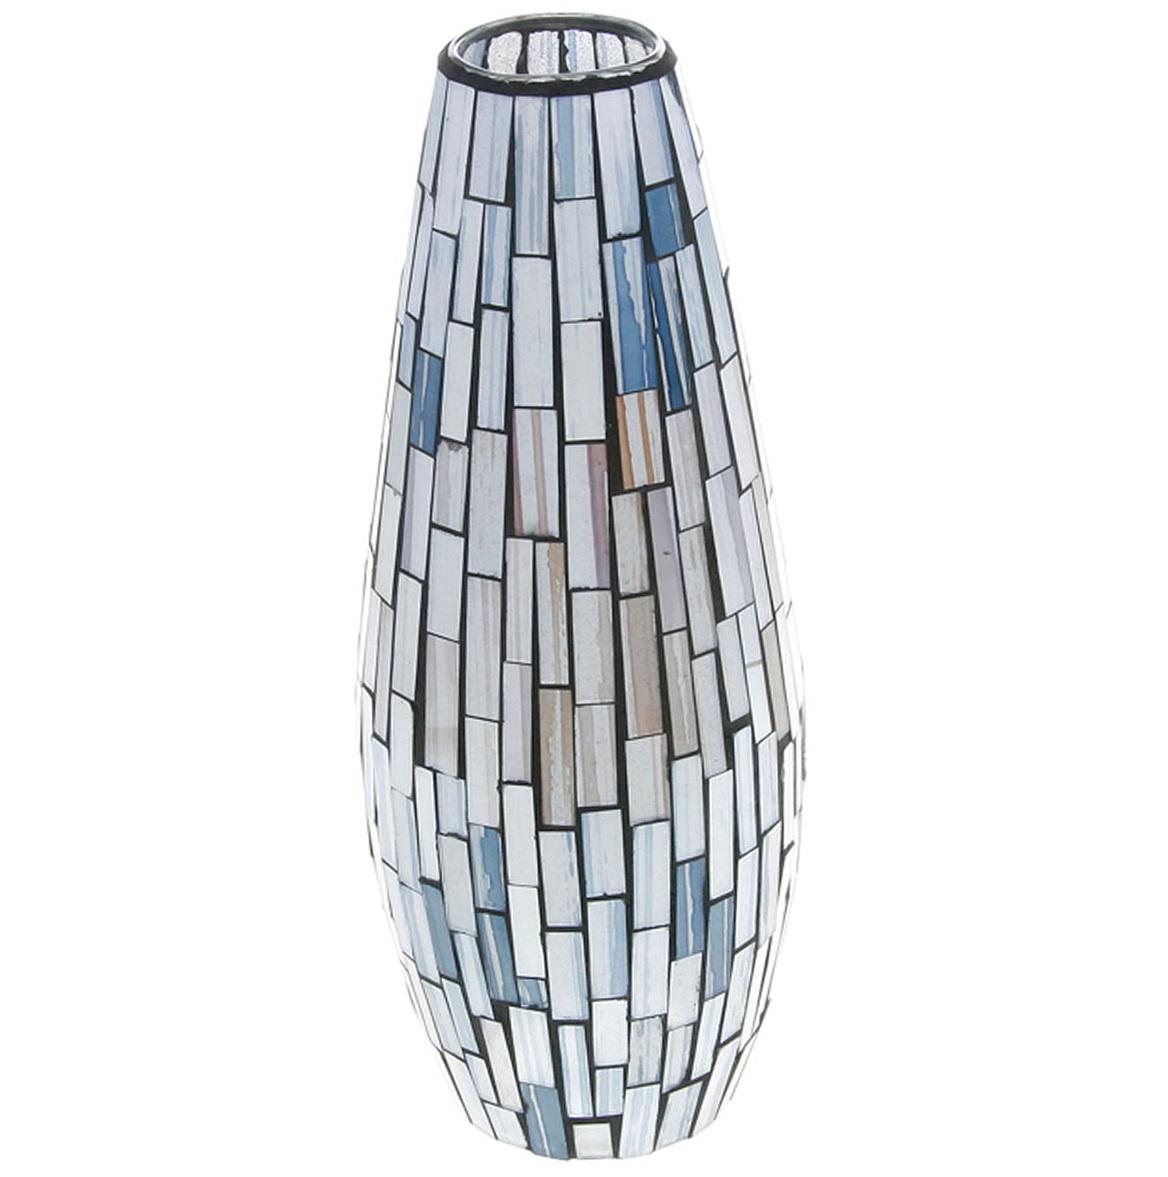 Cheap Tall Vases Uk